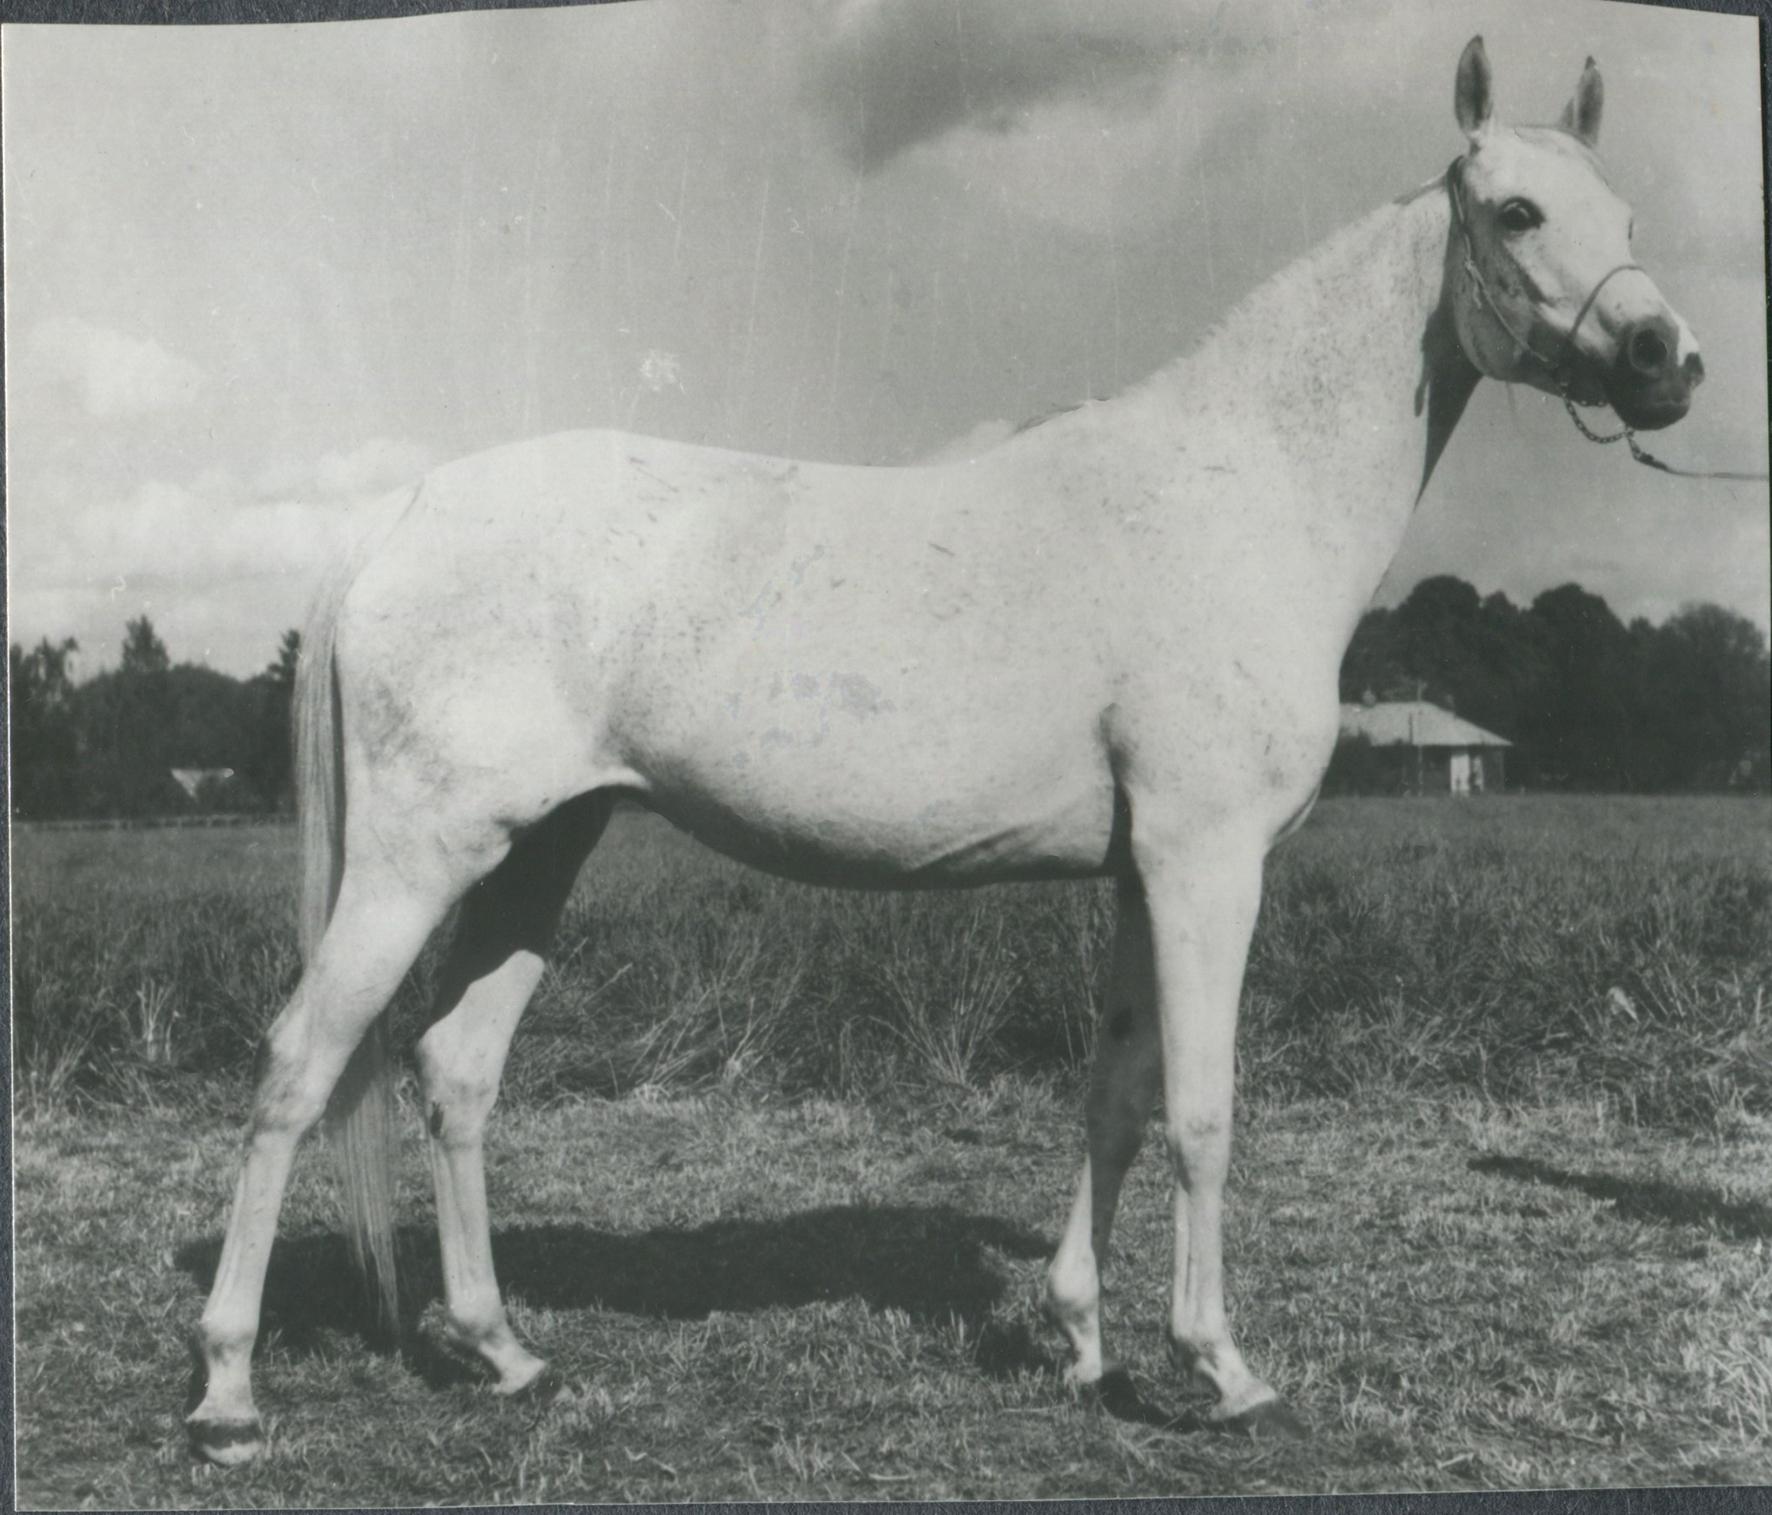 Pierzga 1964 (Negatiw x Piewica/Priboj)